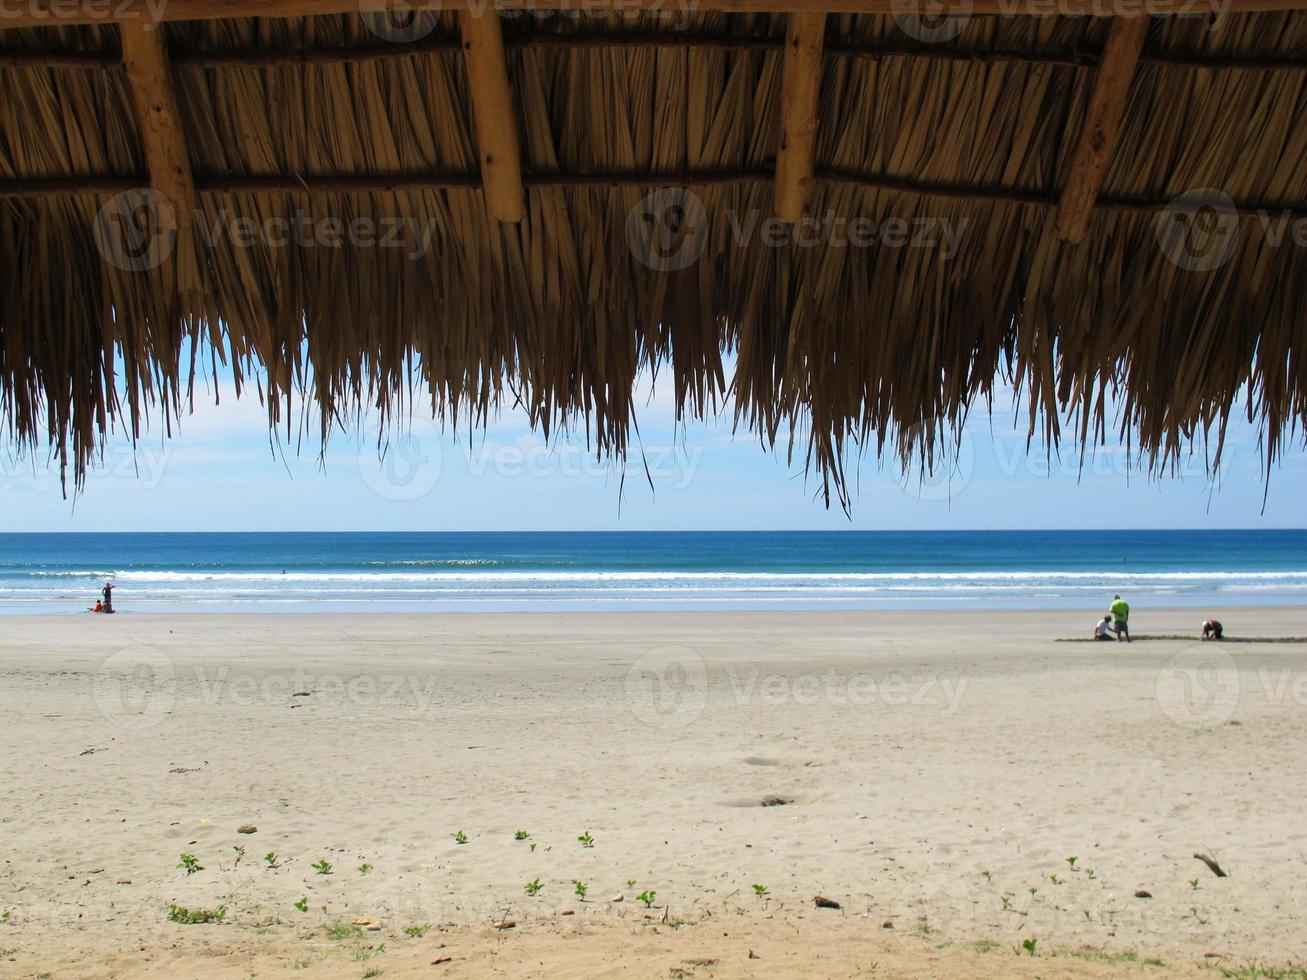 Tranquil beach with palm leaf cabana. photo